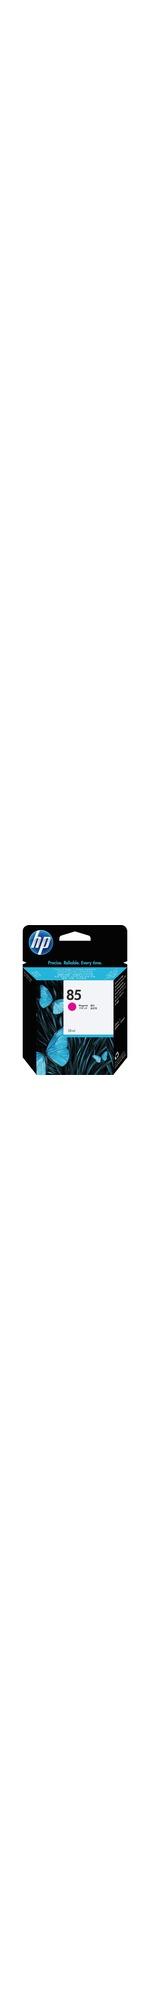 HP No. 85 Ink Cartridge - Magenta